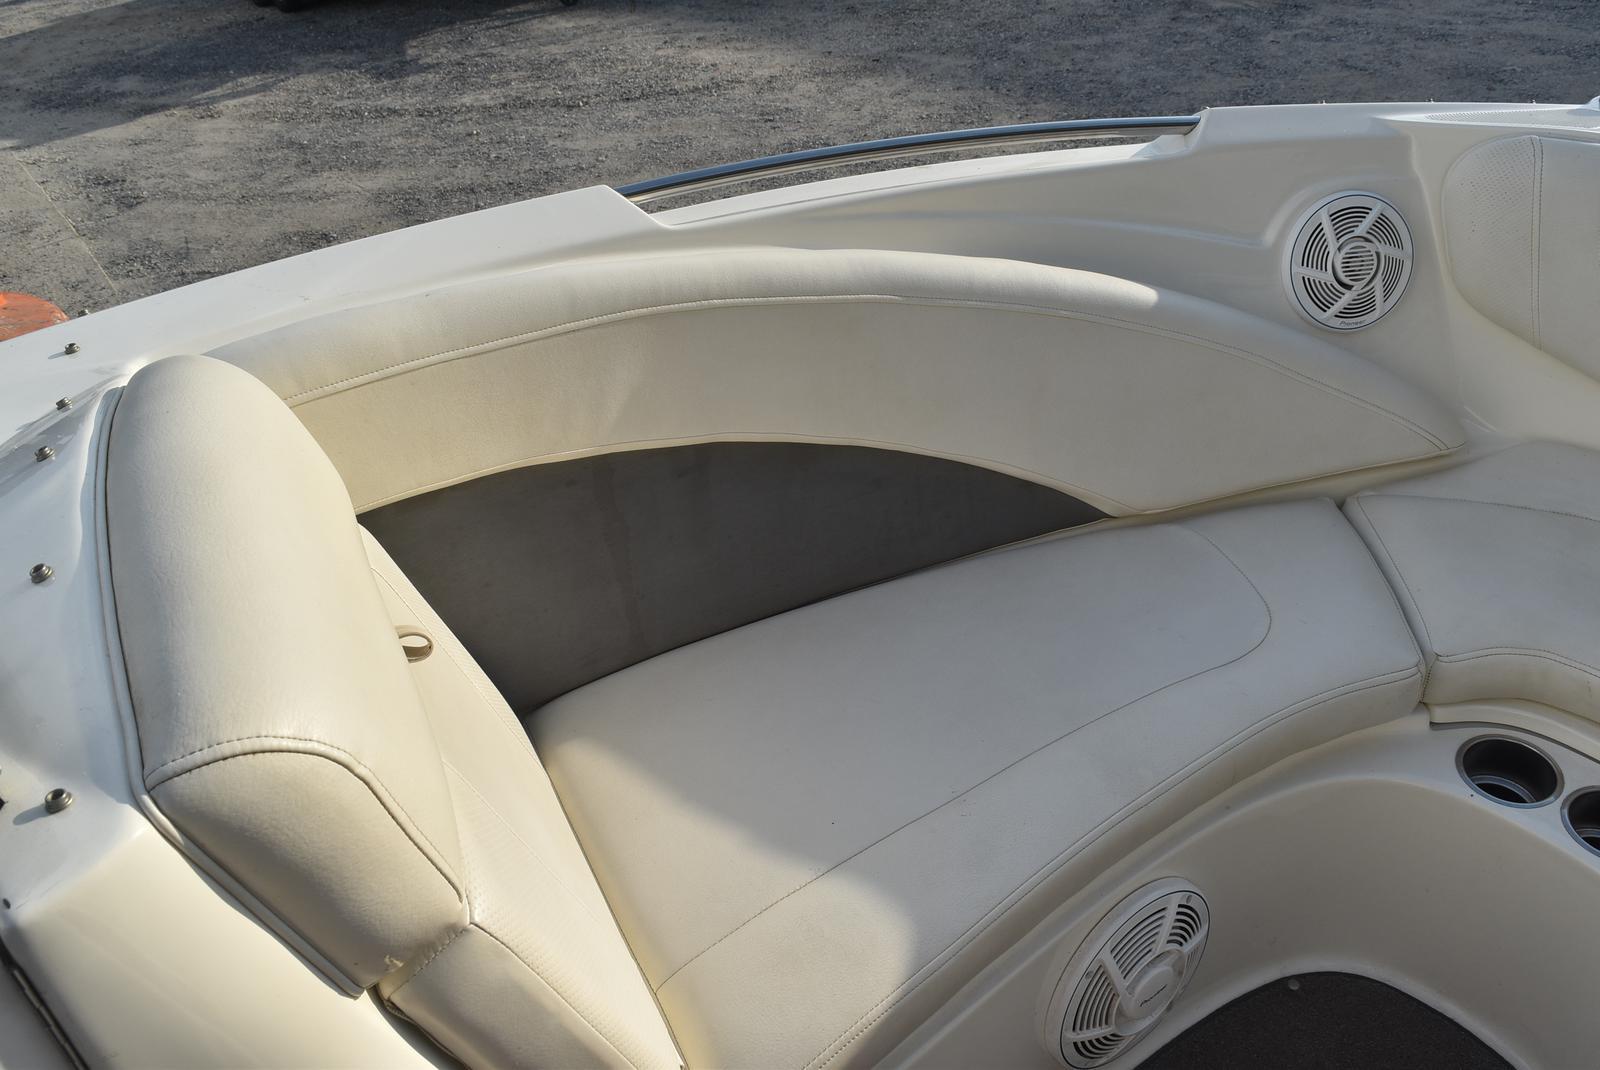 2010 Bayliner boat for sale, model of the boat is 235BR & Image # 5 of 43